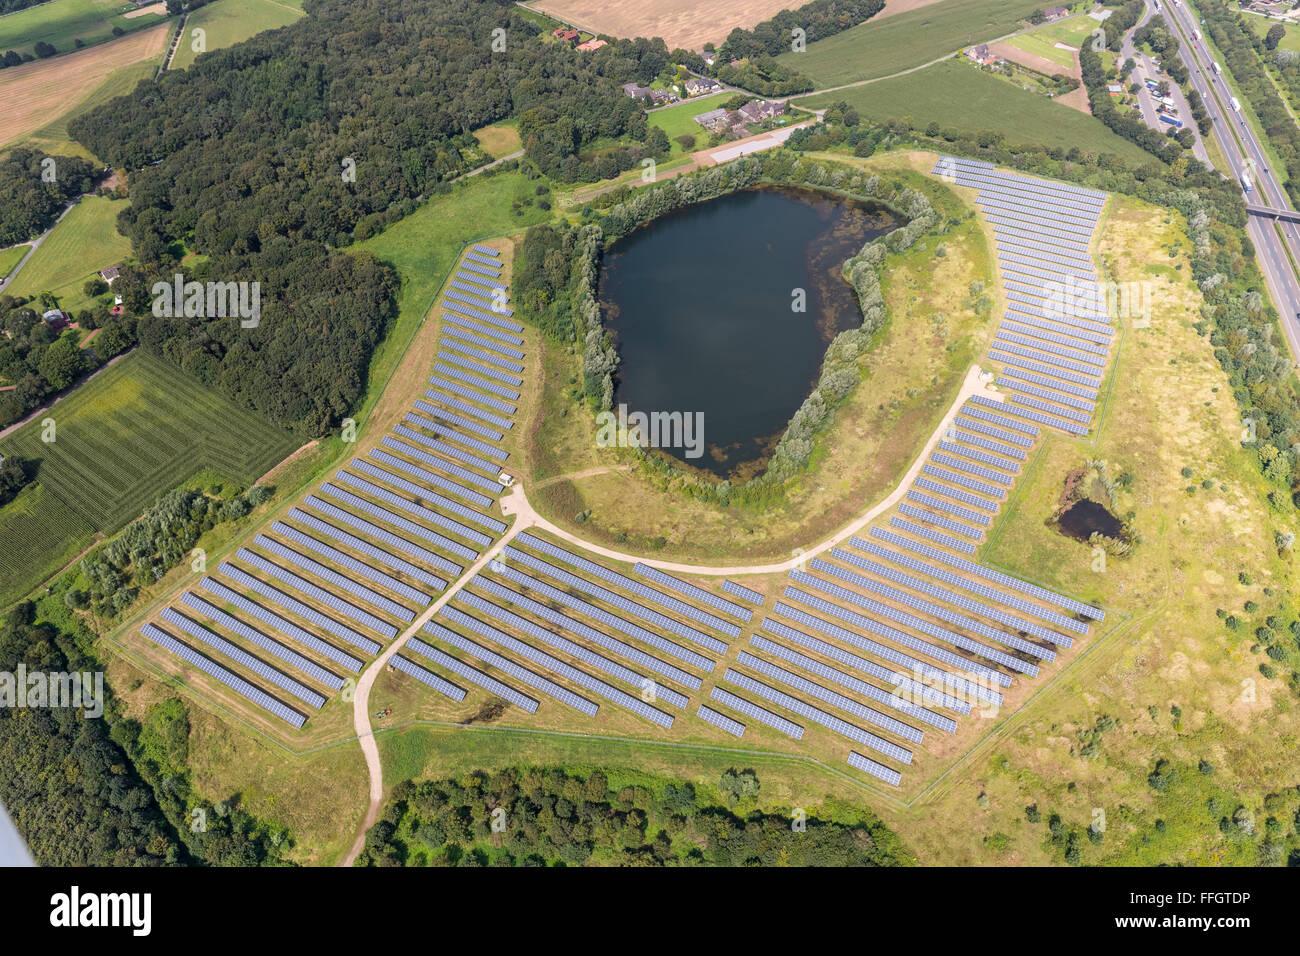 Vista aérea, paneles solares, en Grafschafter Mühlenfeld Park Road, Neukirchen, Bajo Rhin, Renania del Imagen De Stock